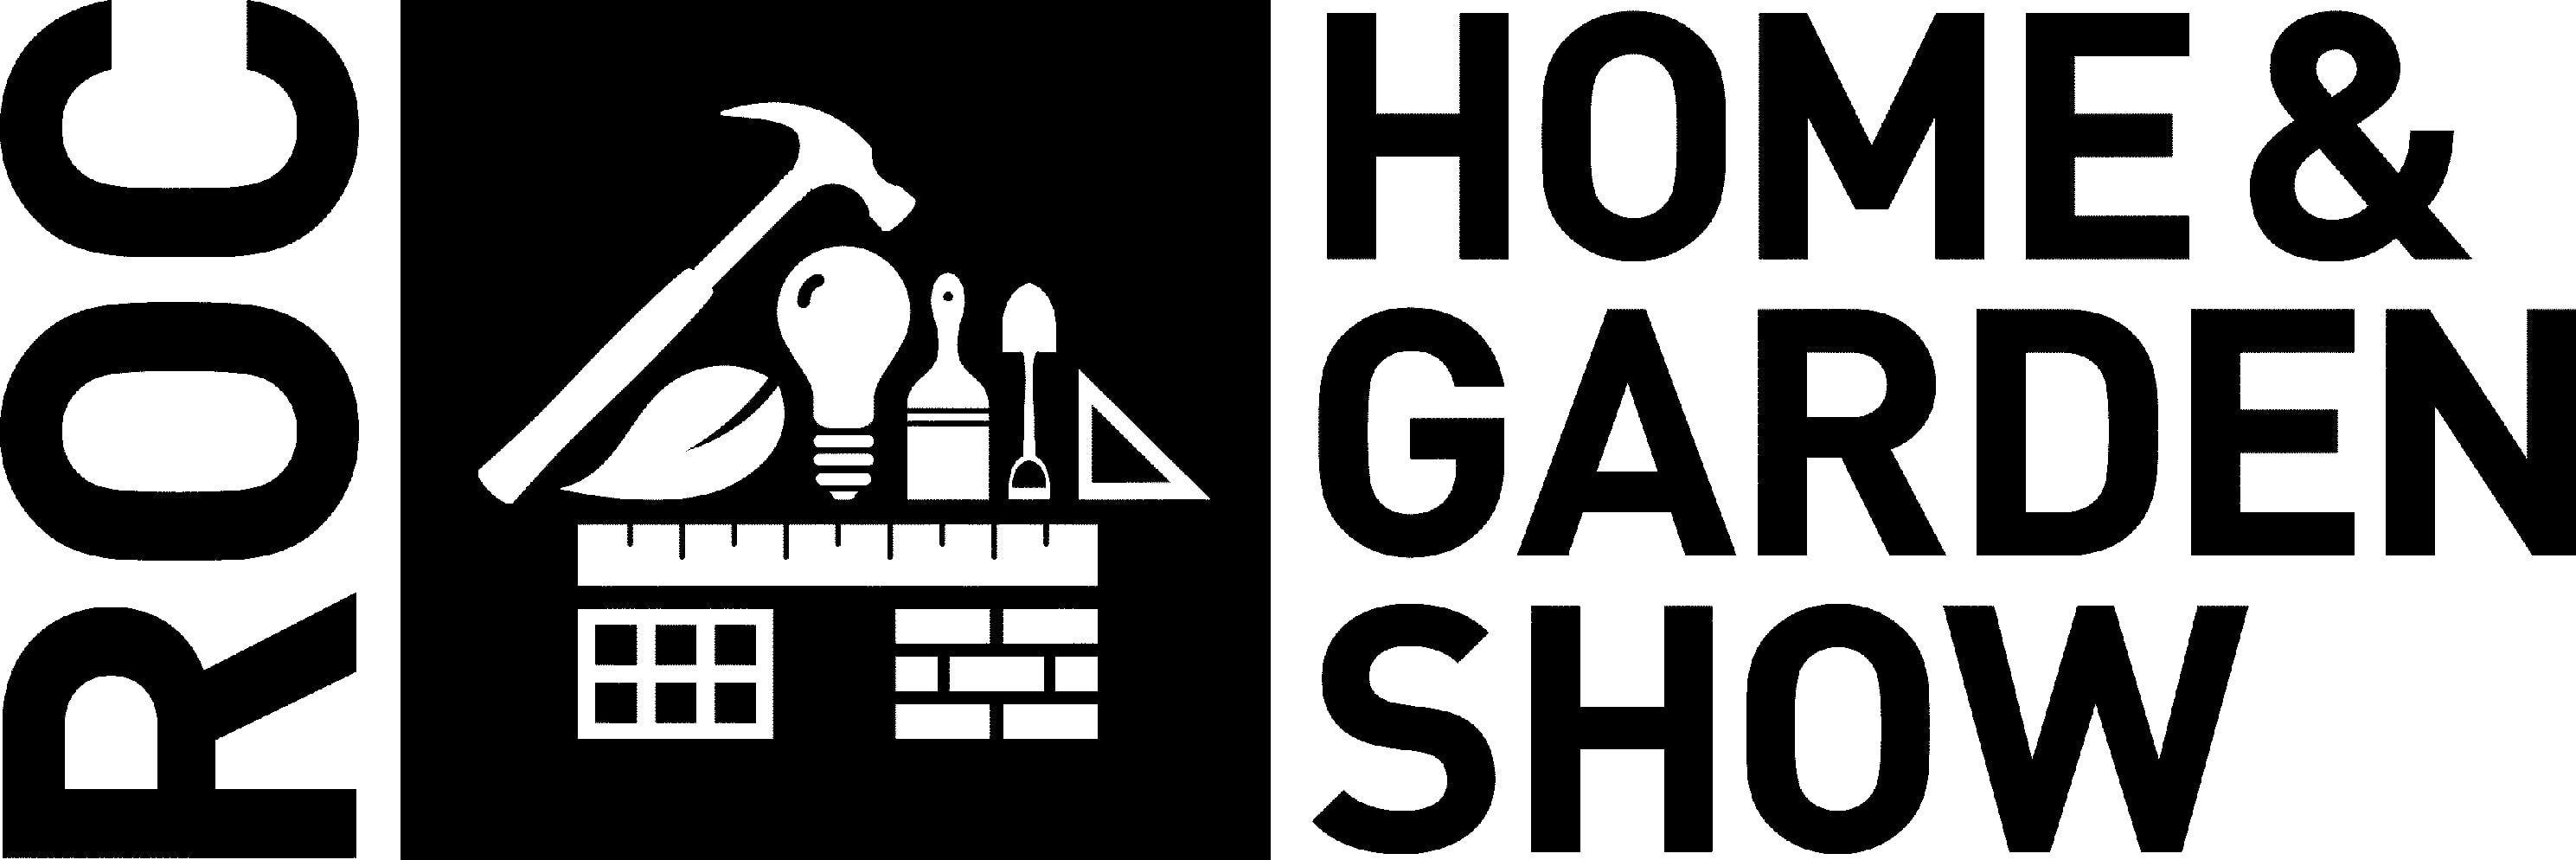 Rochester Home Builders Association Home and Garden Show